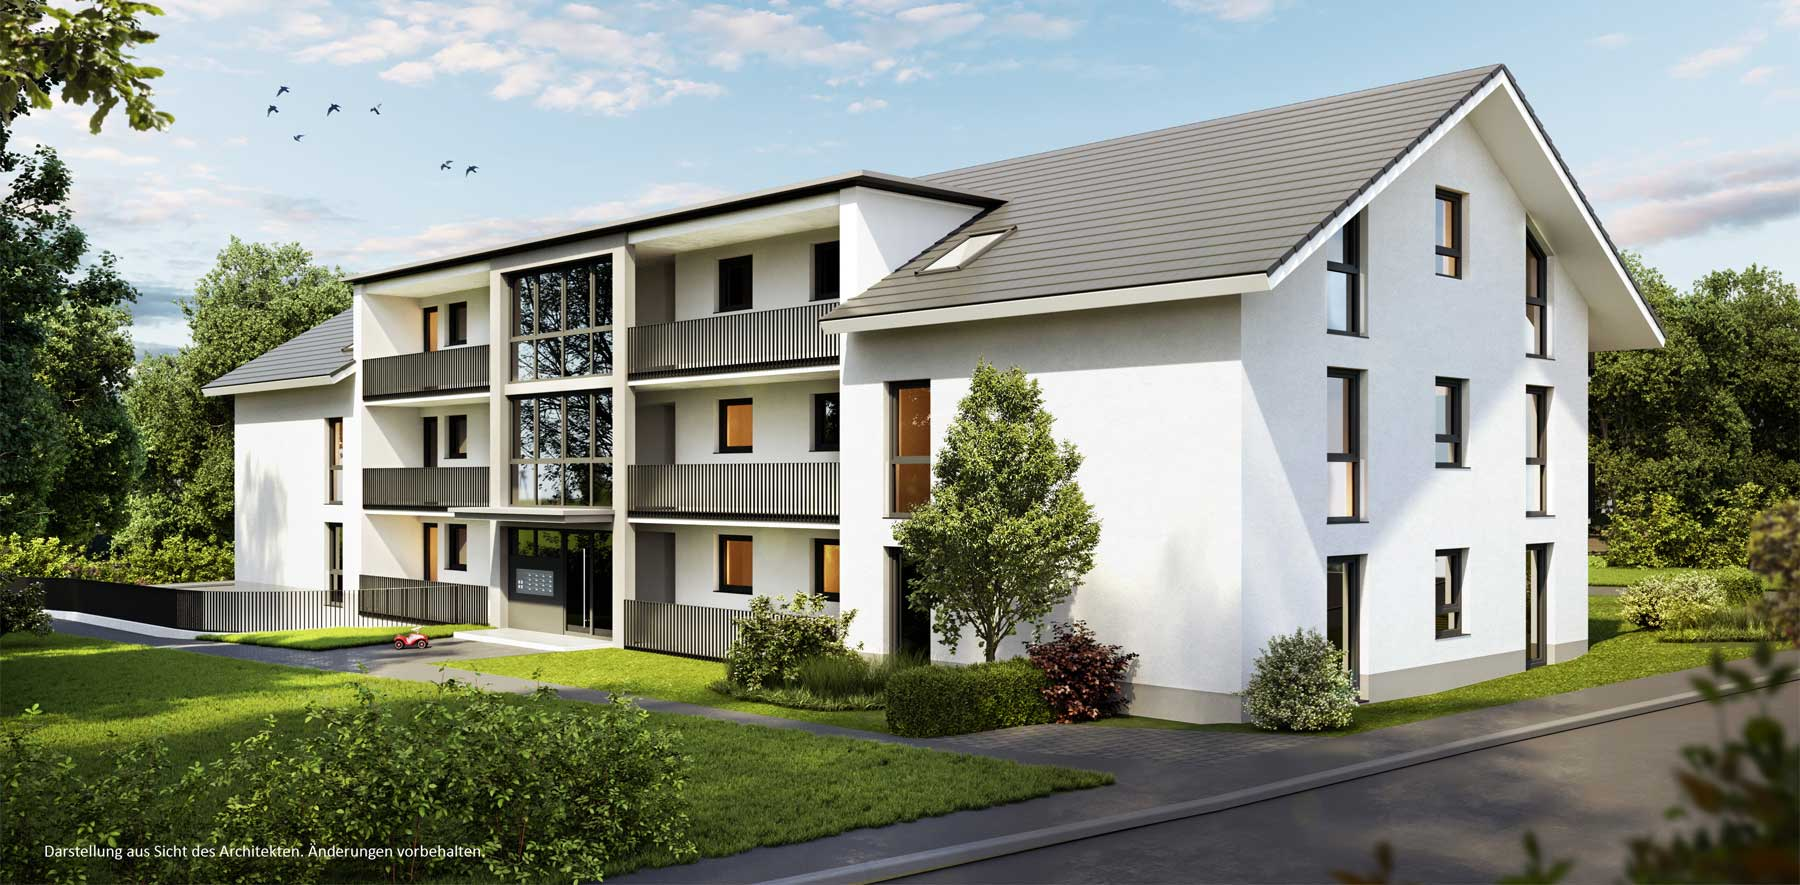 merz-immobilien-oberndorf-lindenhof-neubau-slider